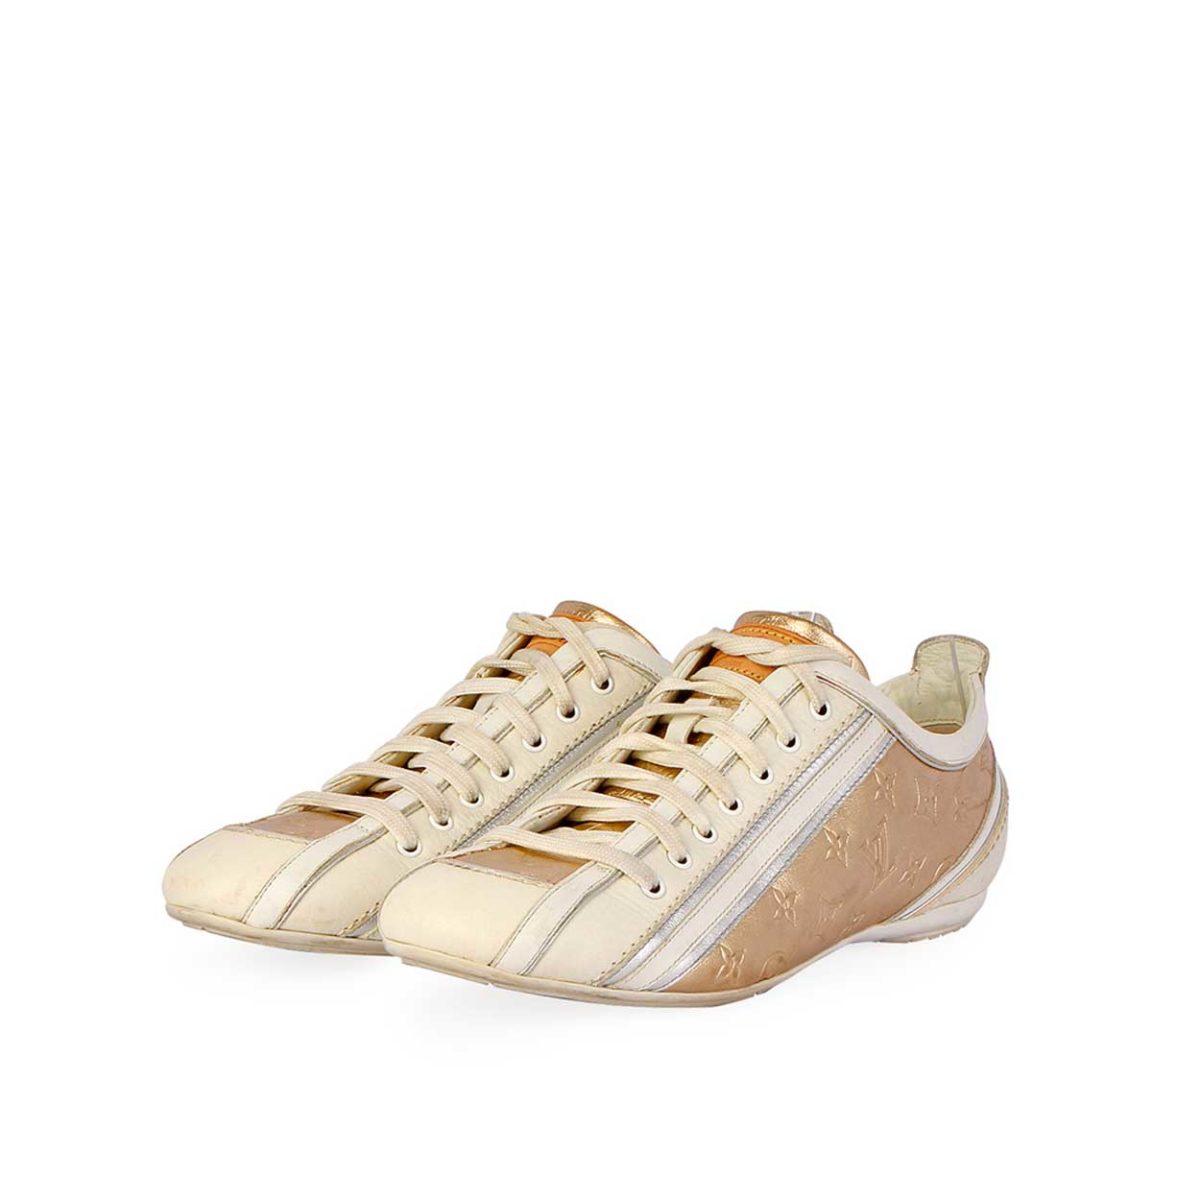 eb8524cacce5 LOUIS VUITTON Monogram Sneakers White Gold – S  36 (3.5)